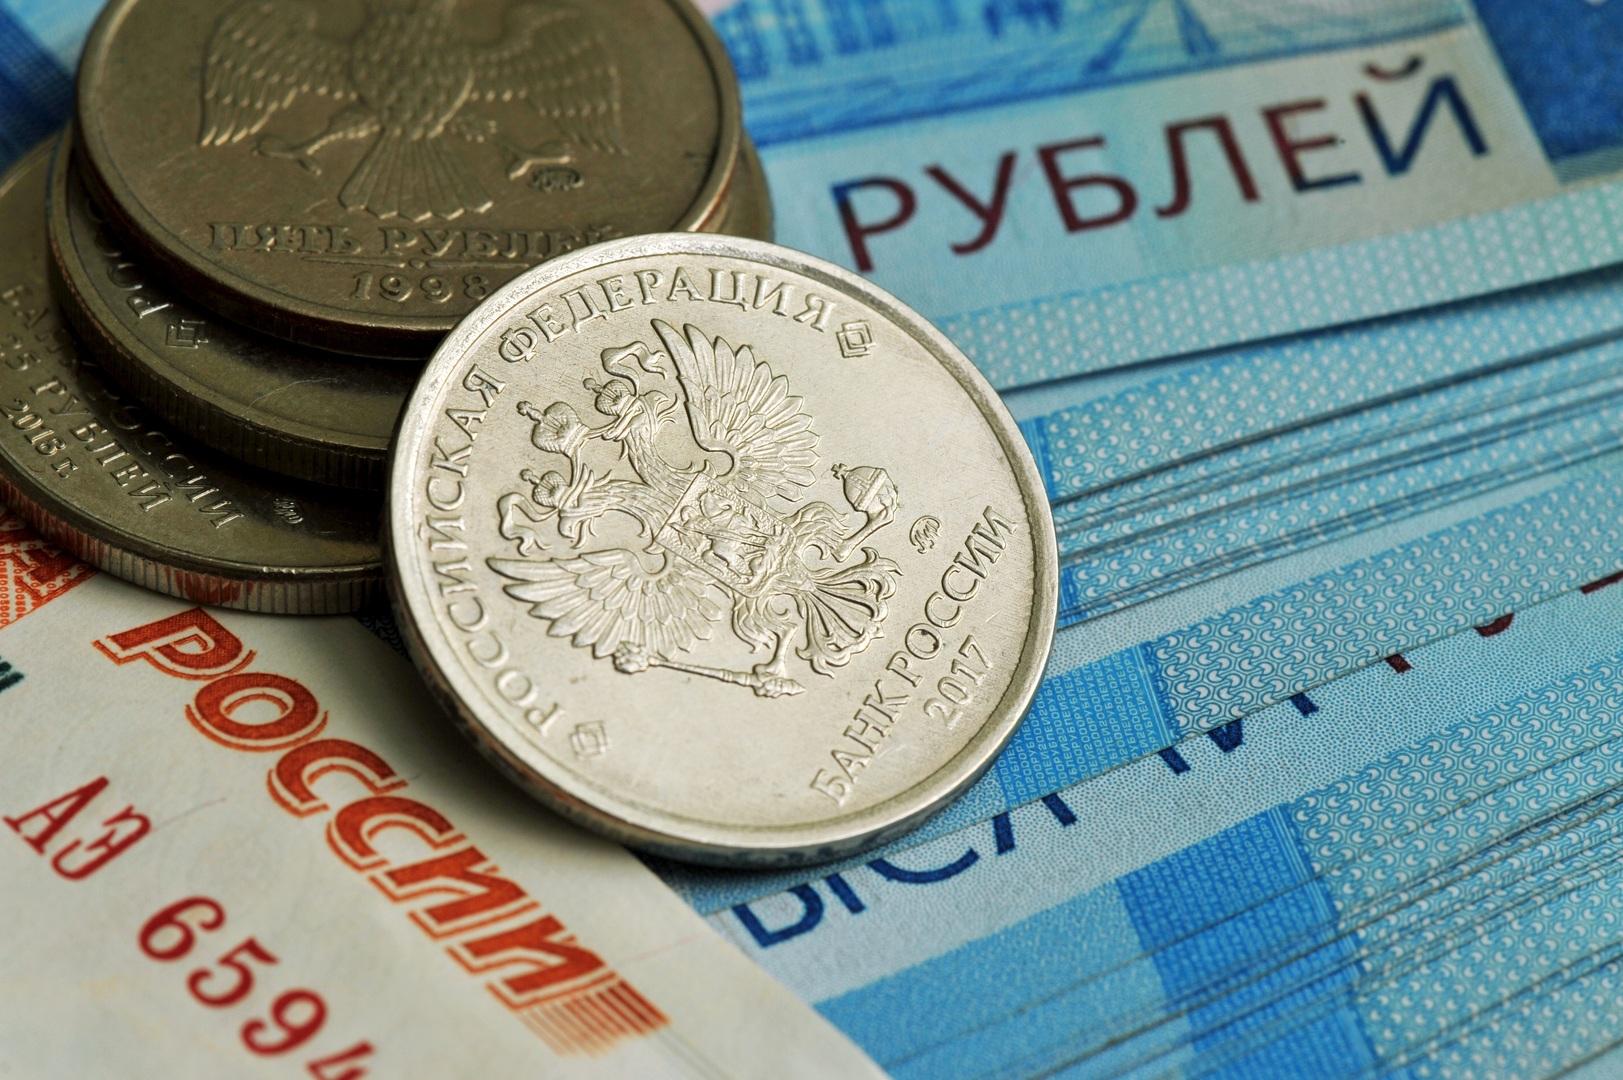 روسيا تضاعف احتياطي صندوق سيادي بفضل